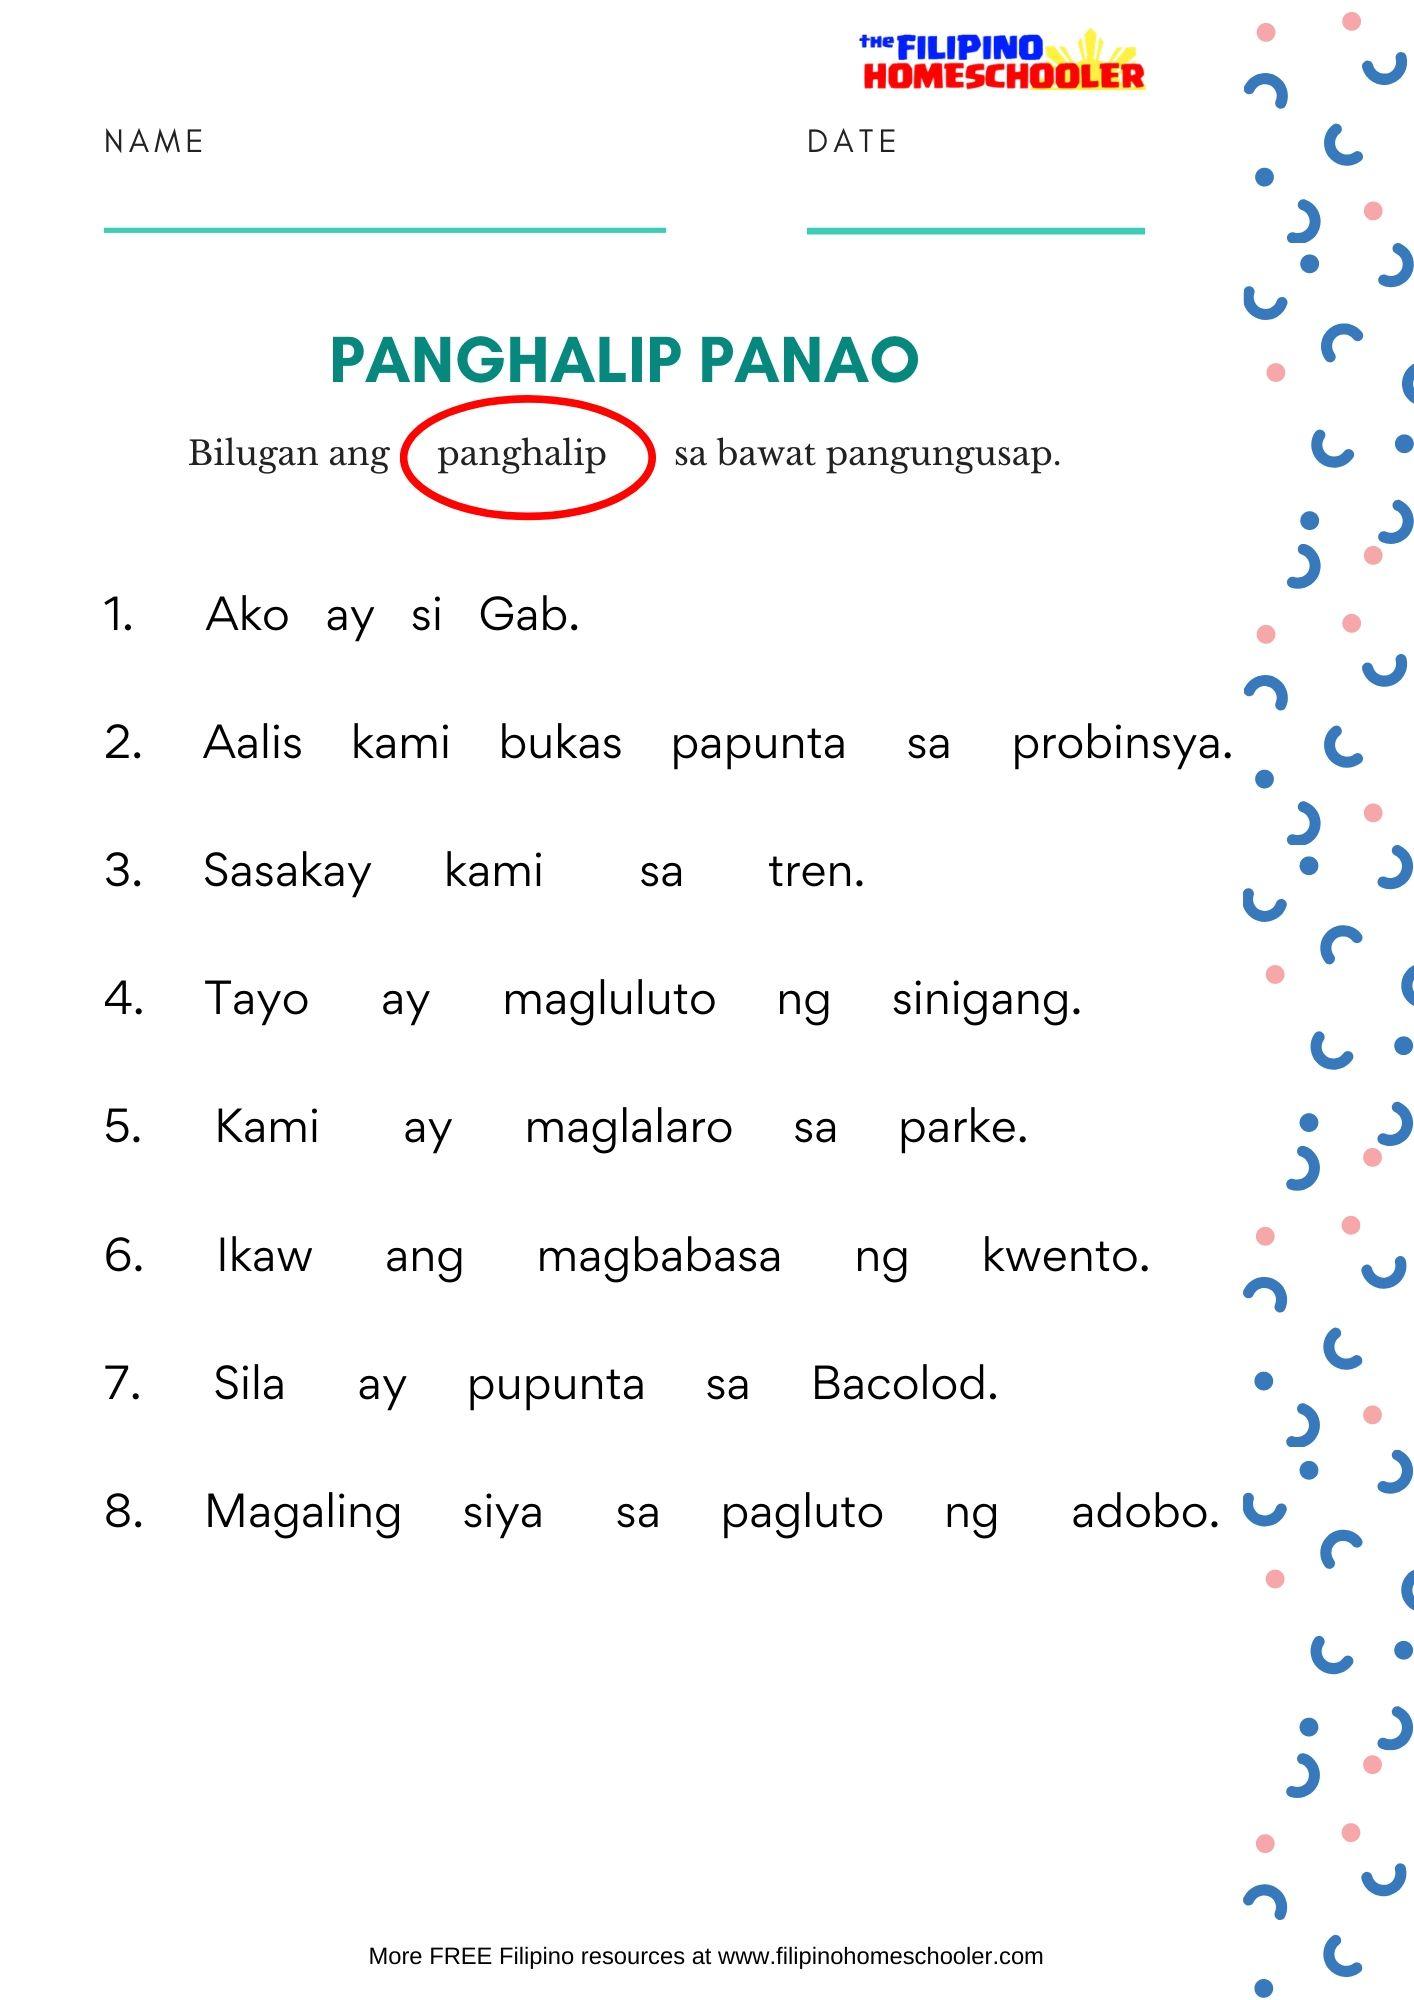 hight resolution of Free Panghalip Panao Worksheet SET 1 — The Filipino Homeschooler